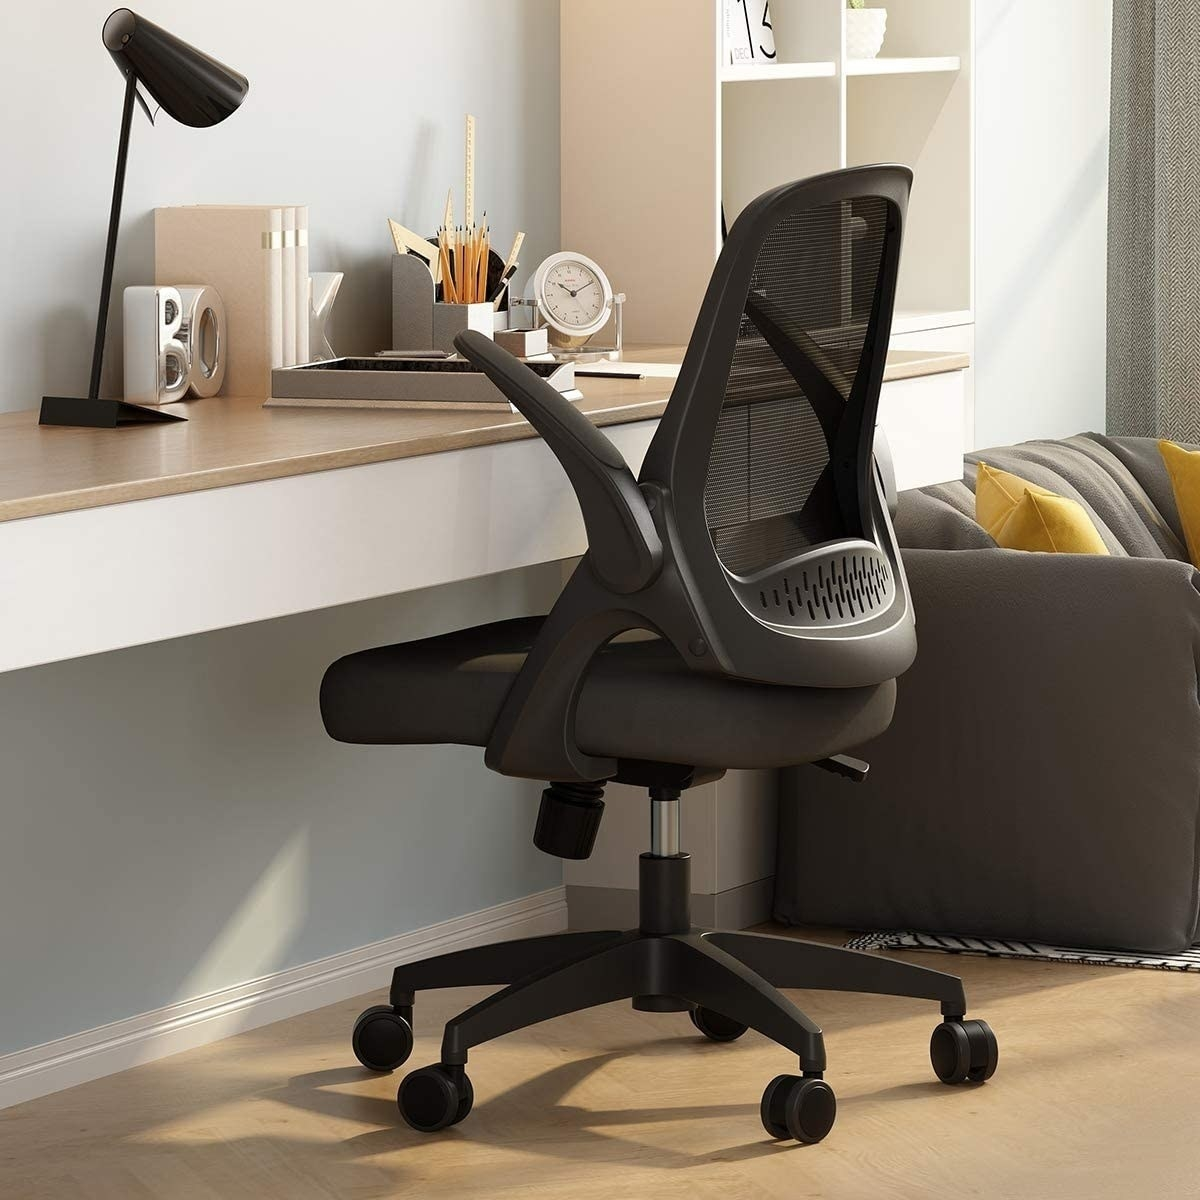 The black desk chair